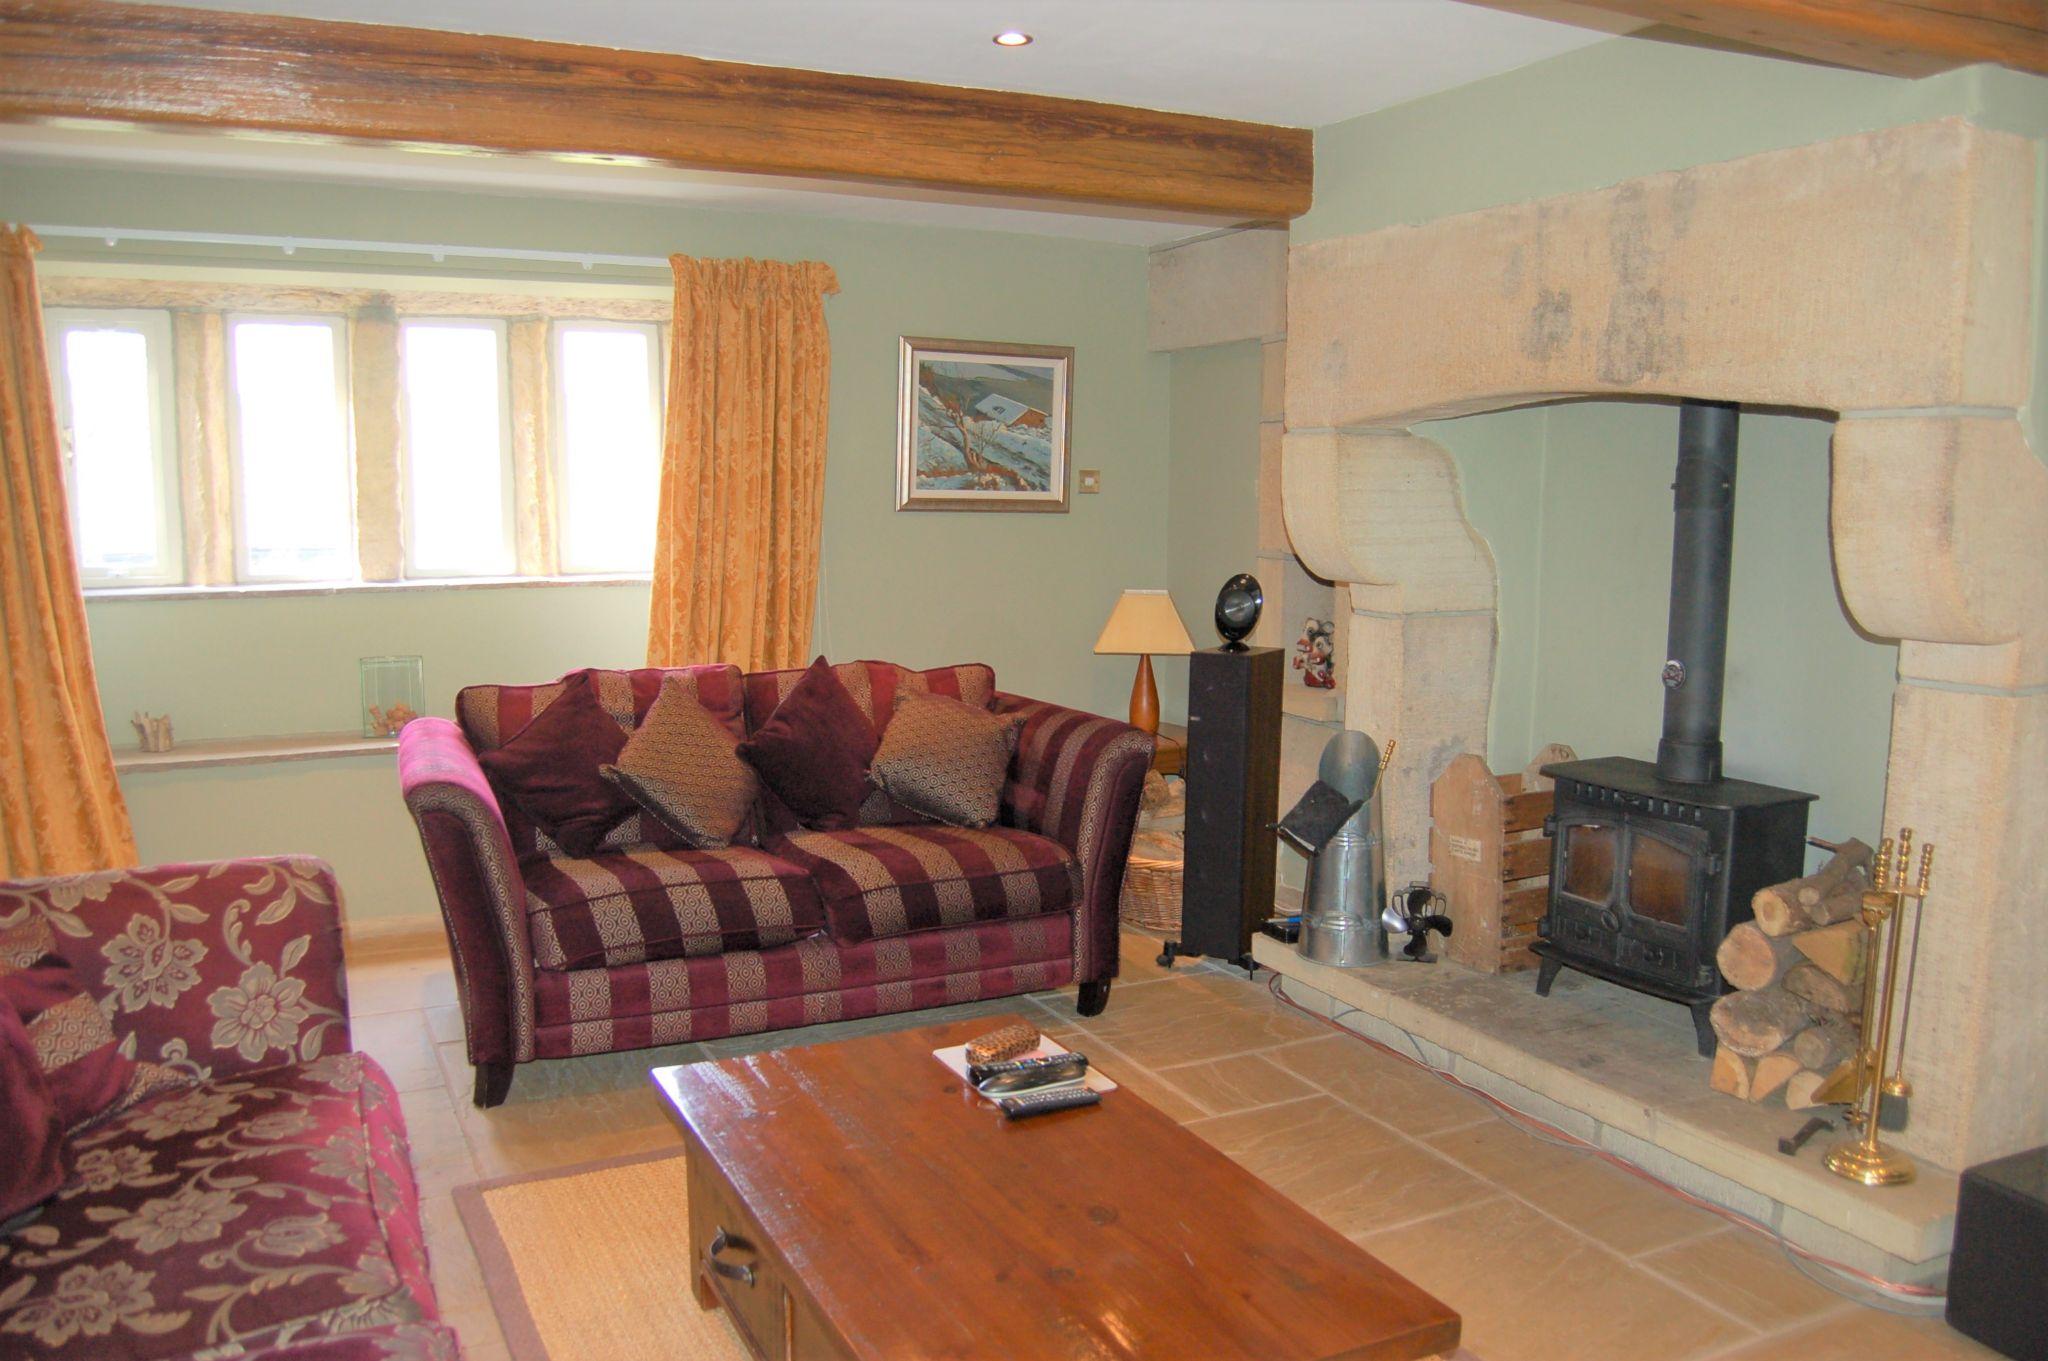 5 bedroom detached house For Sale in Hebden Bridge - Property photograph